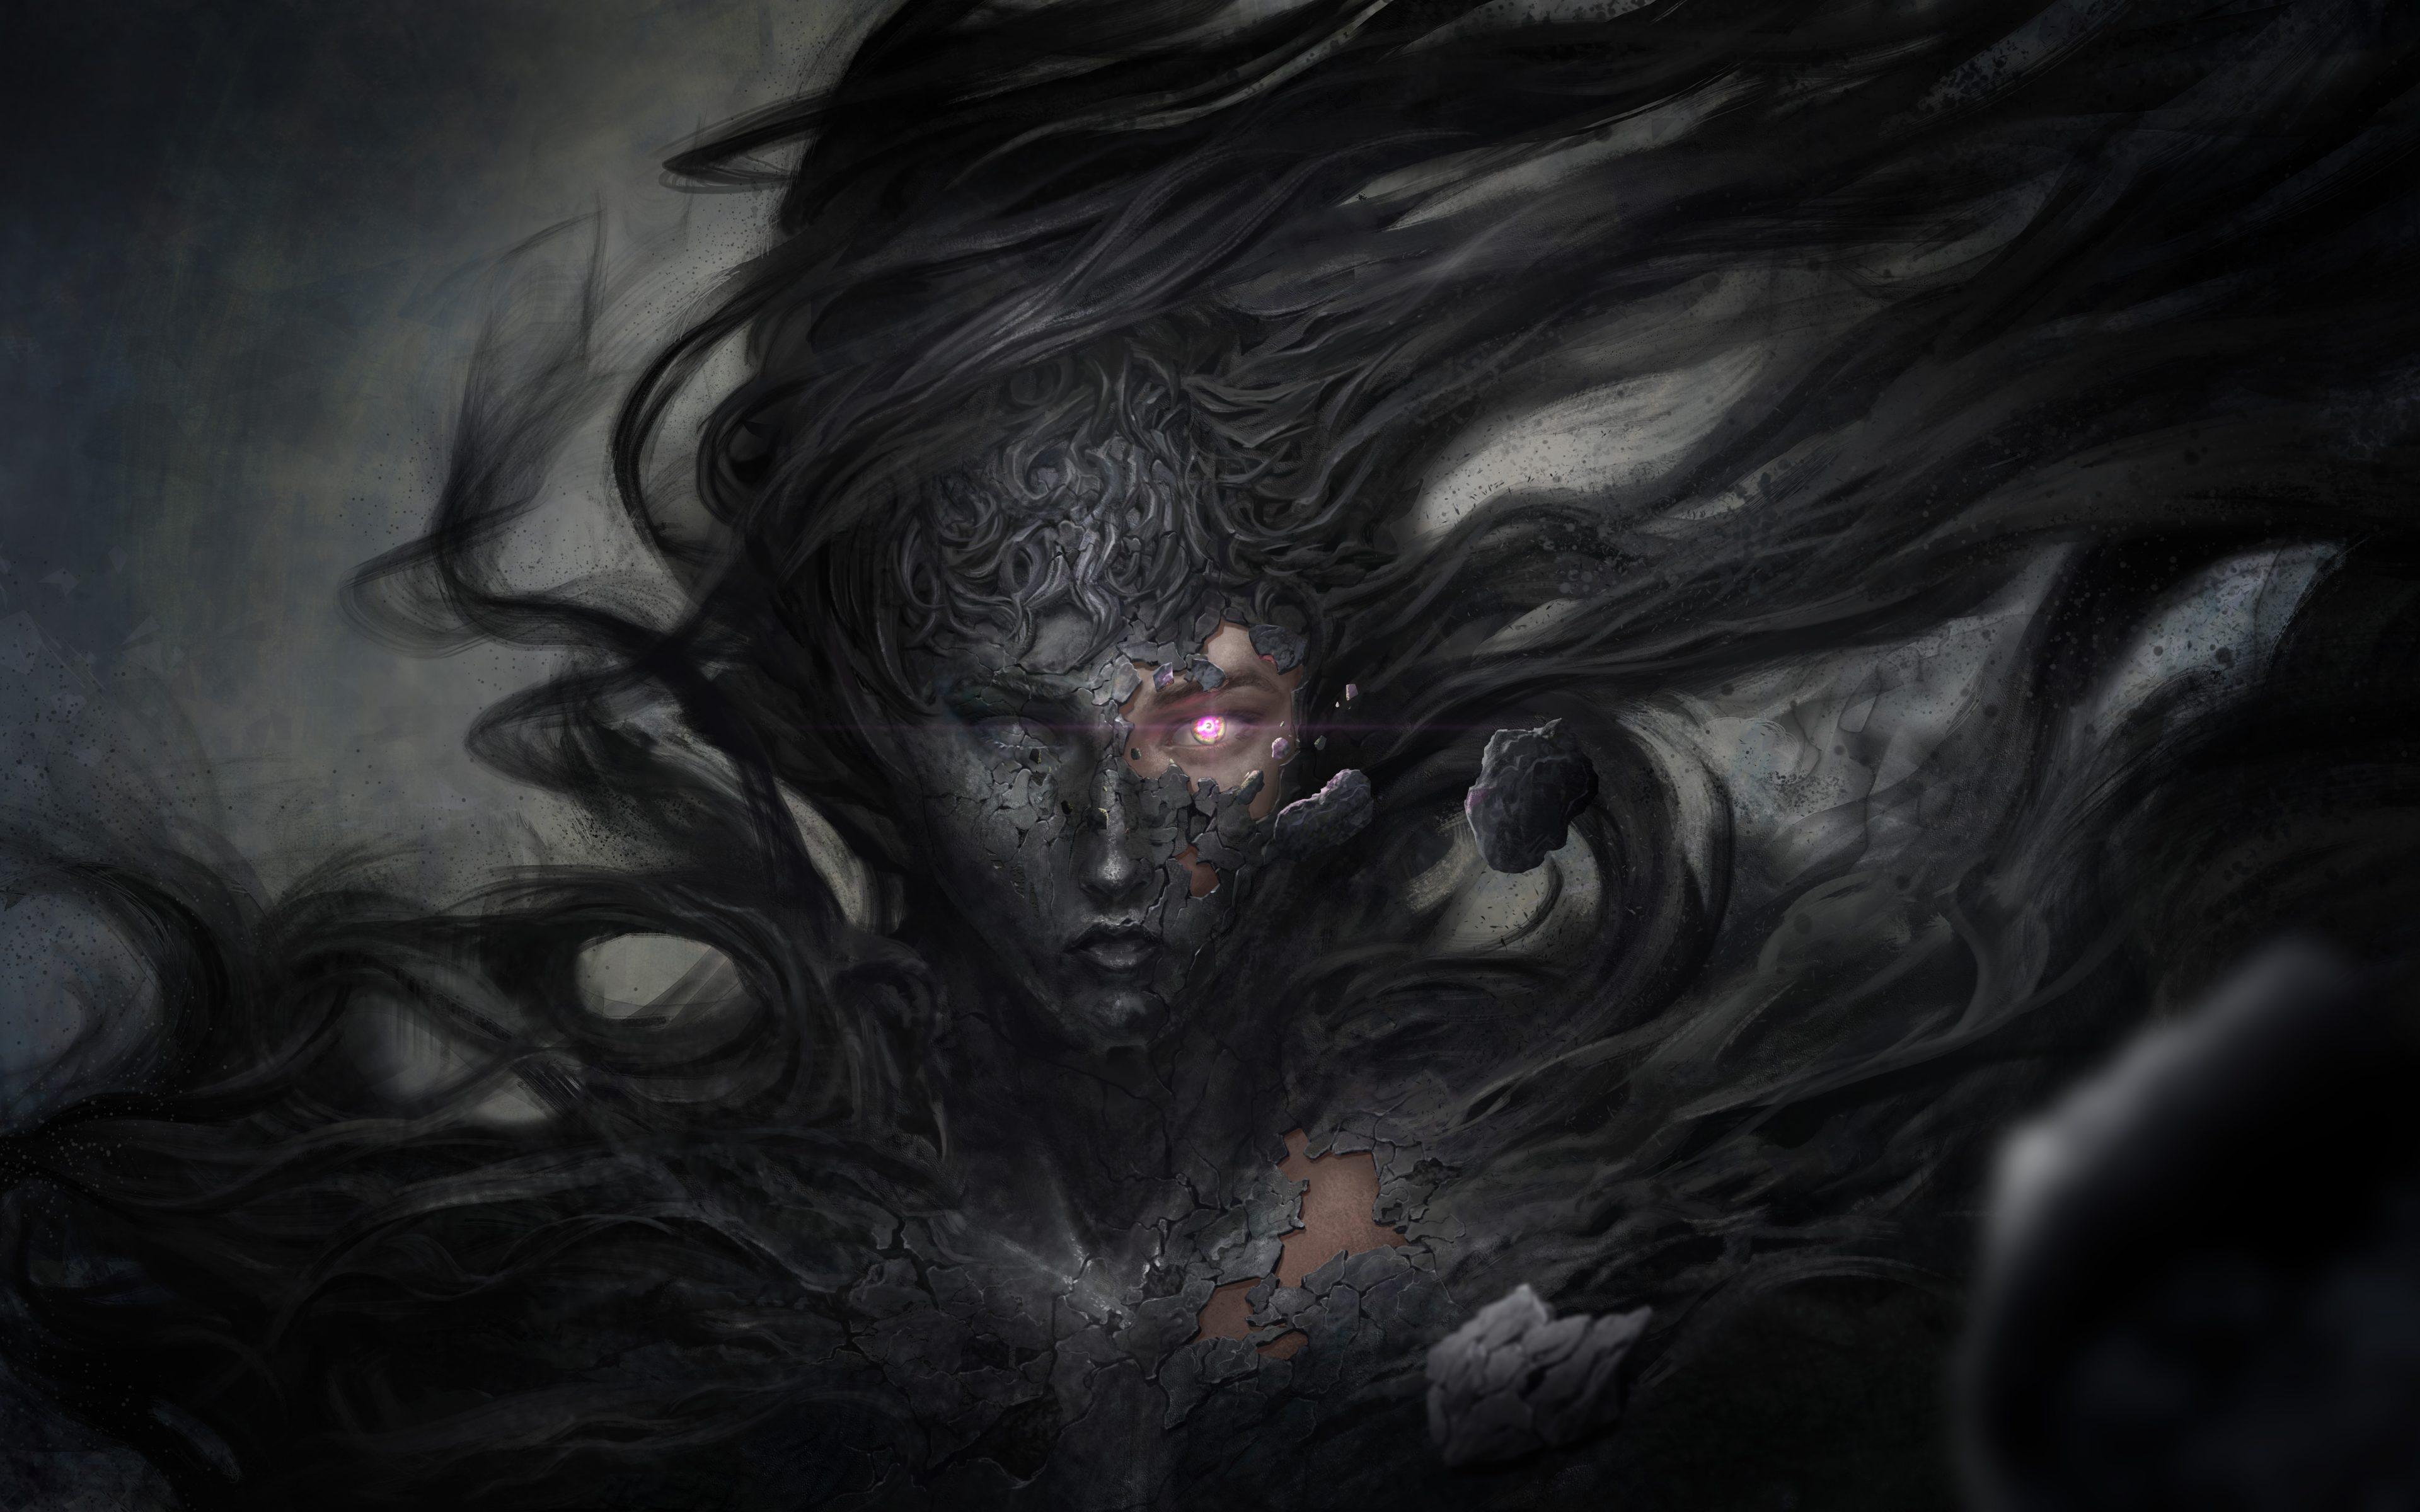 Dark demon witch fantasy 8k wallpaper best wallpapers - Demon wallpaper 4k ...